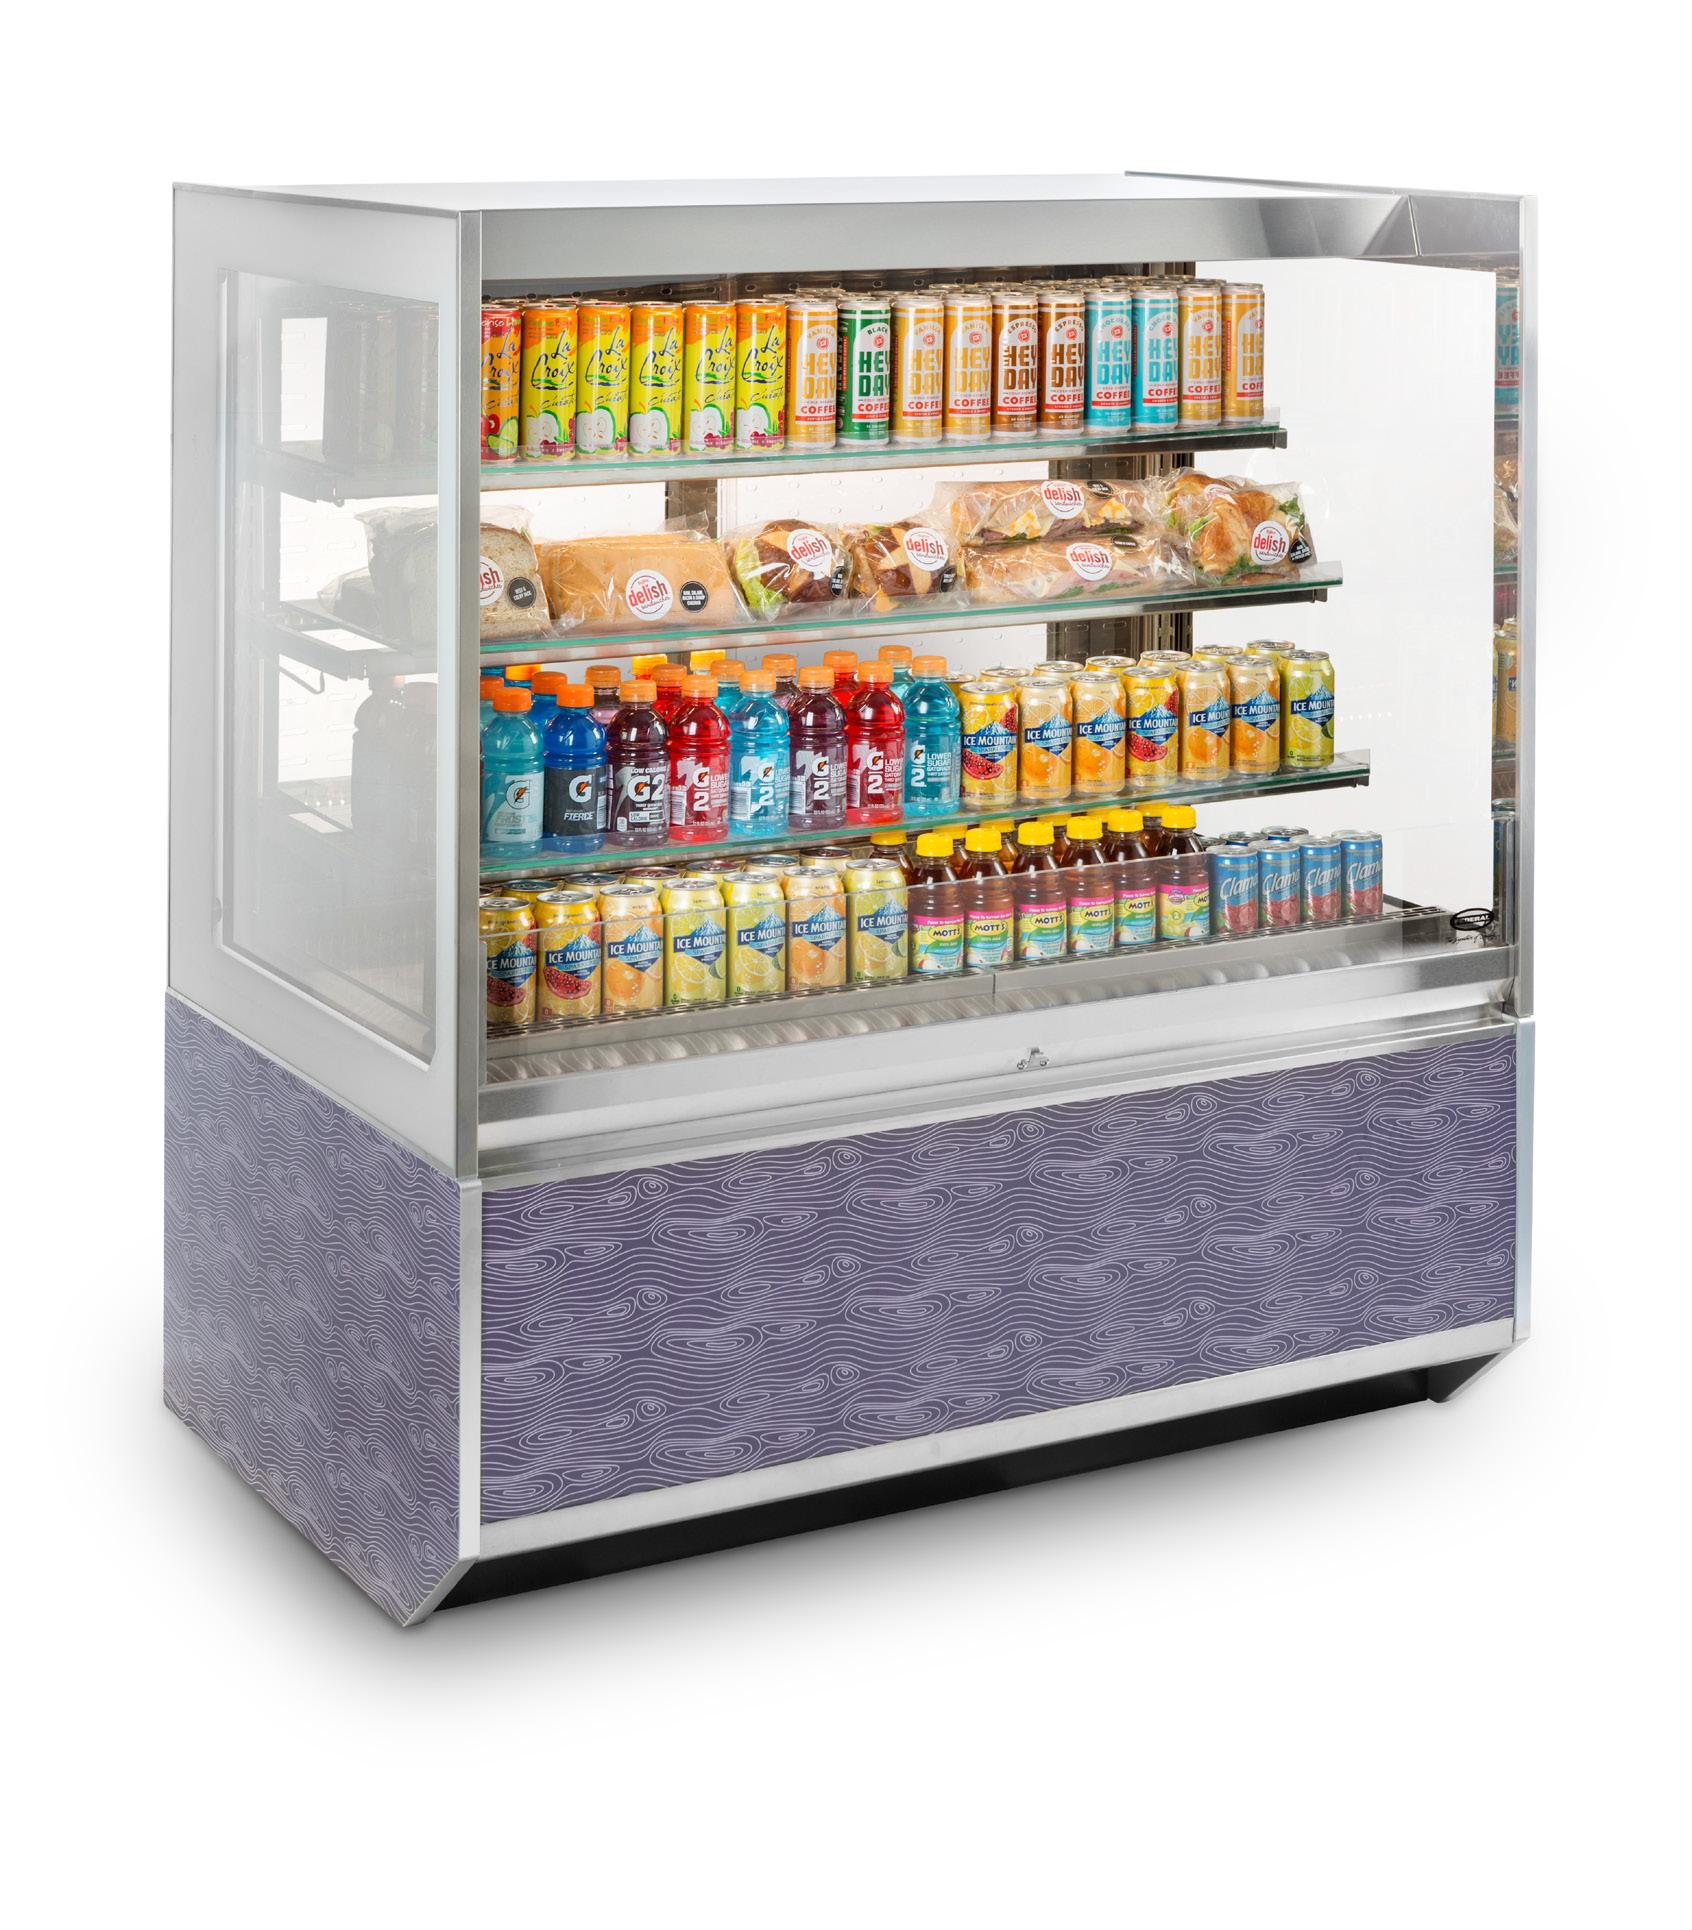 itrss3626-b18-italian-glass-refrigerated-self-serve-merchandiserabc9928d2d90456eb03ba16c9044e56f1